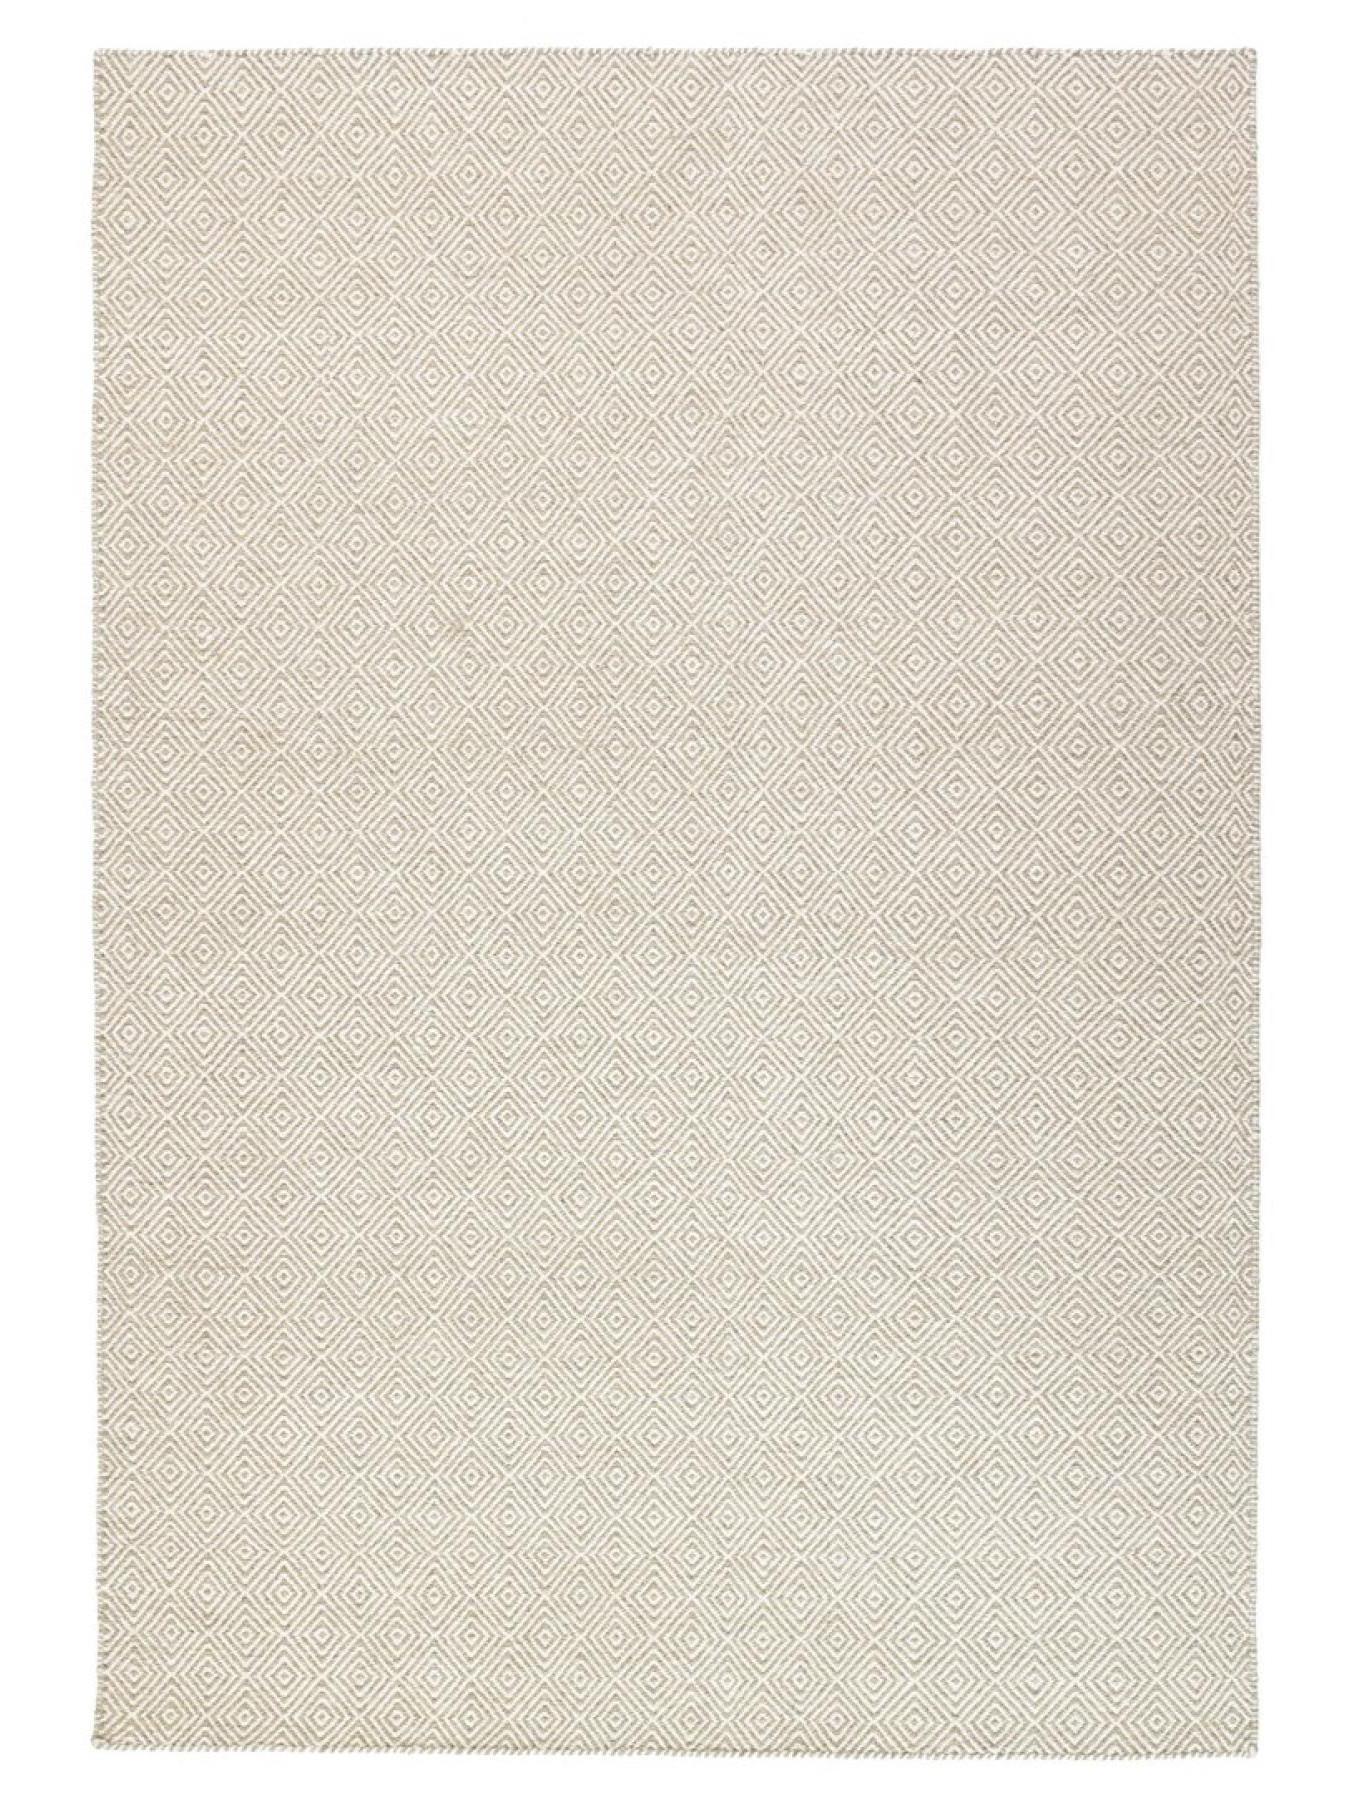 Kilim 604 001 beige kilims modernes n 820 240x170cm - Tapis 200x140 ...